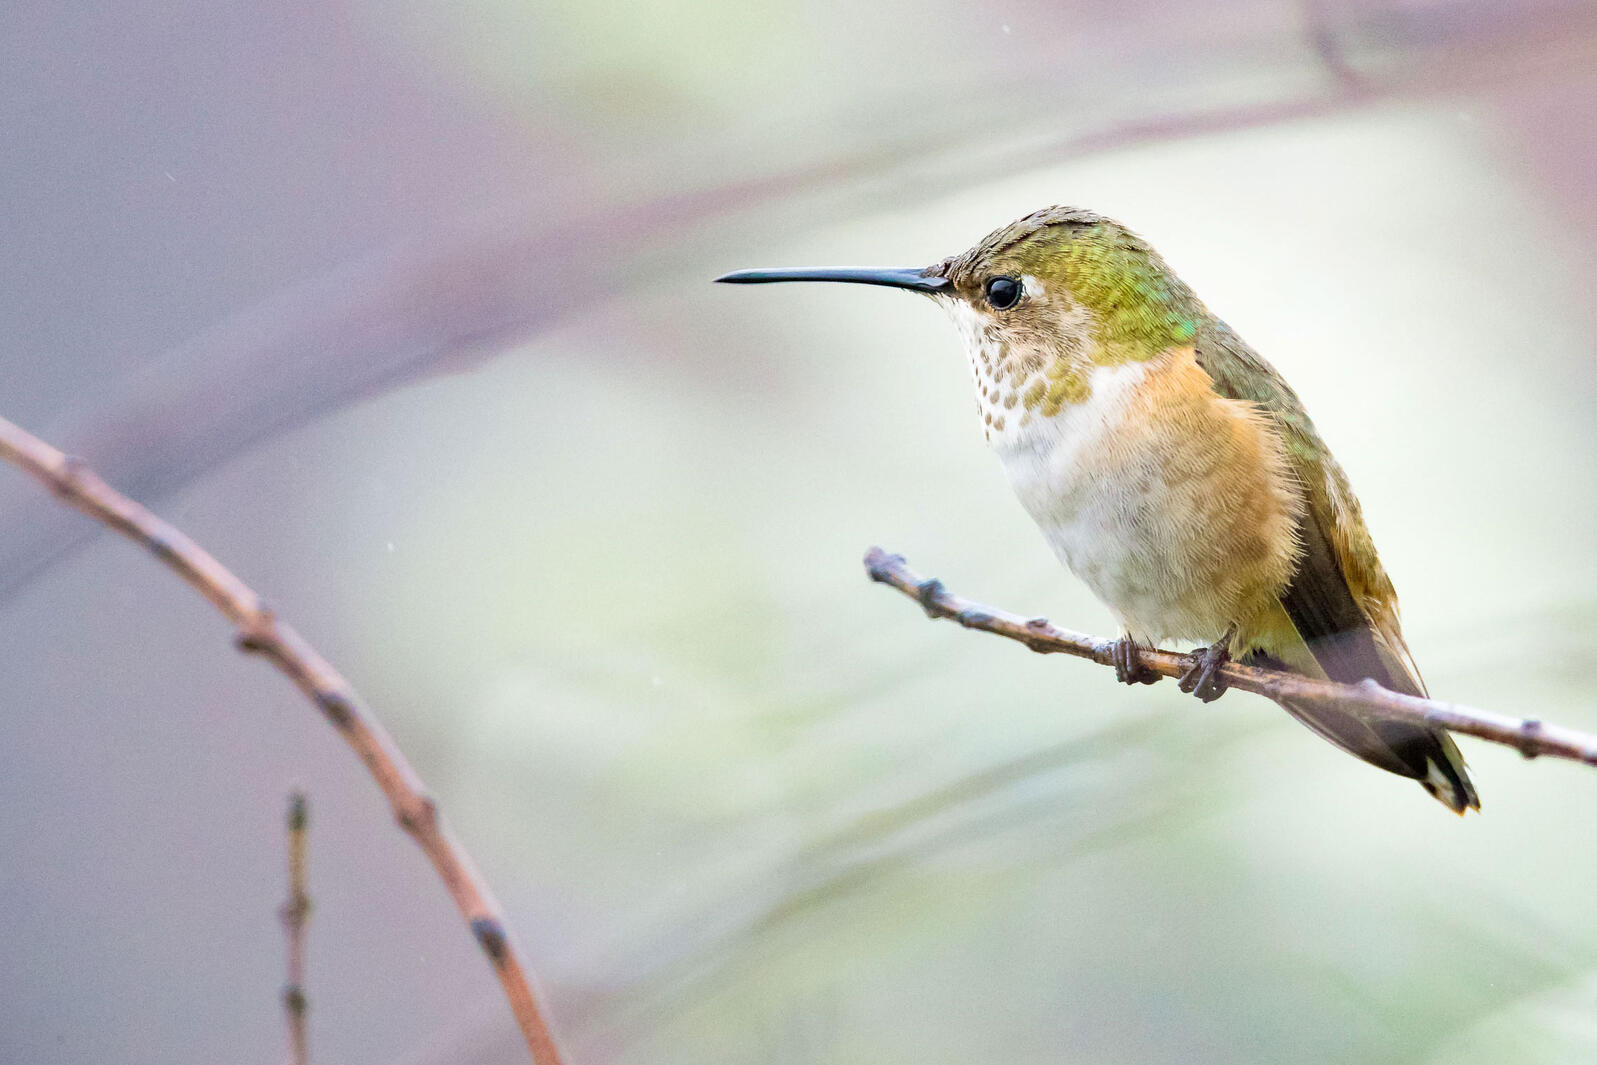 Female Allens Hummingbird. Roy Dunn